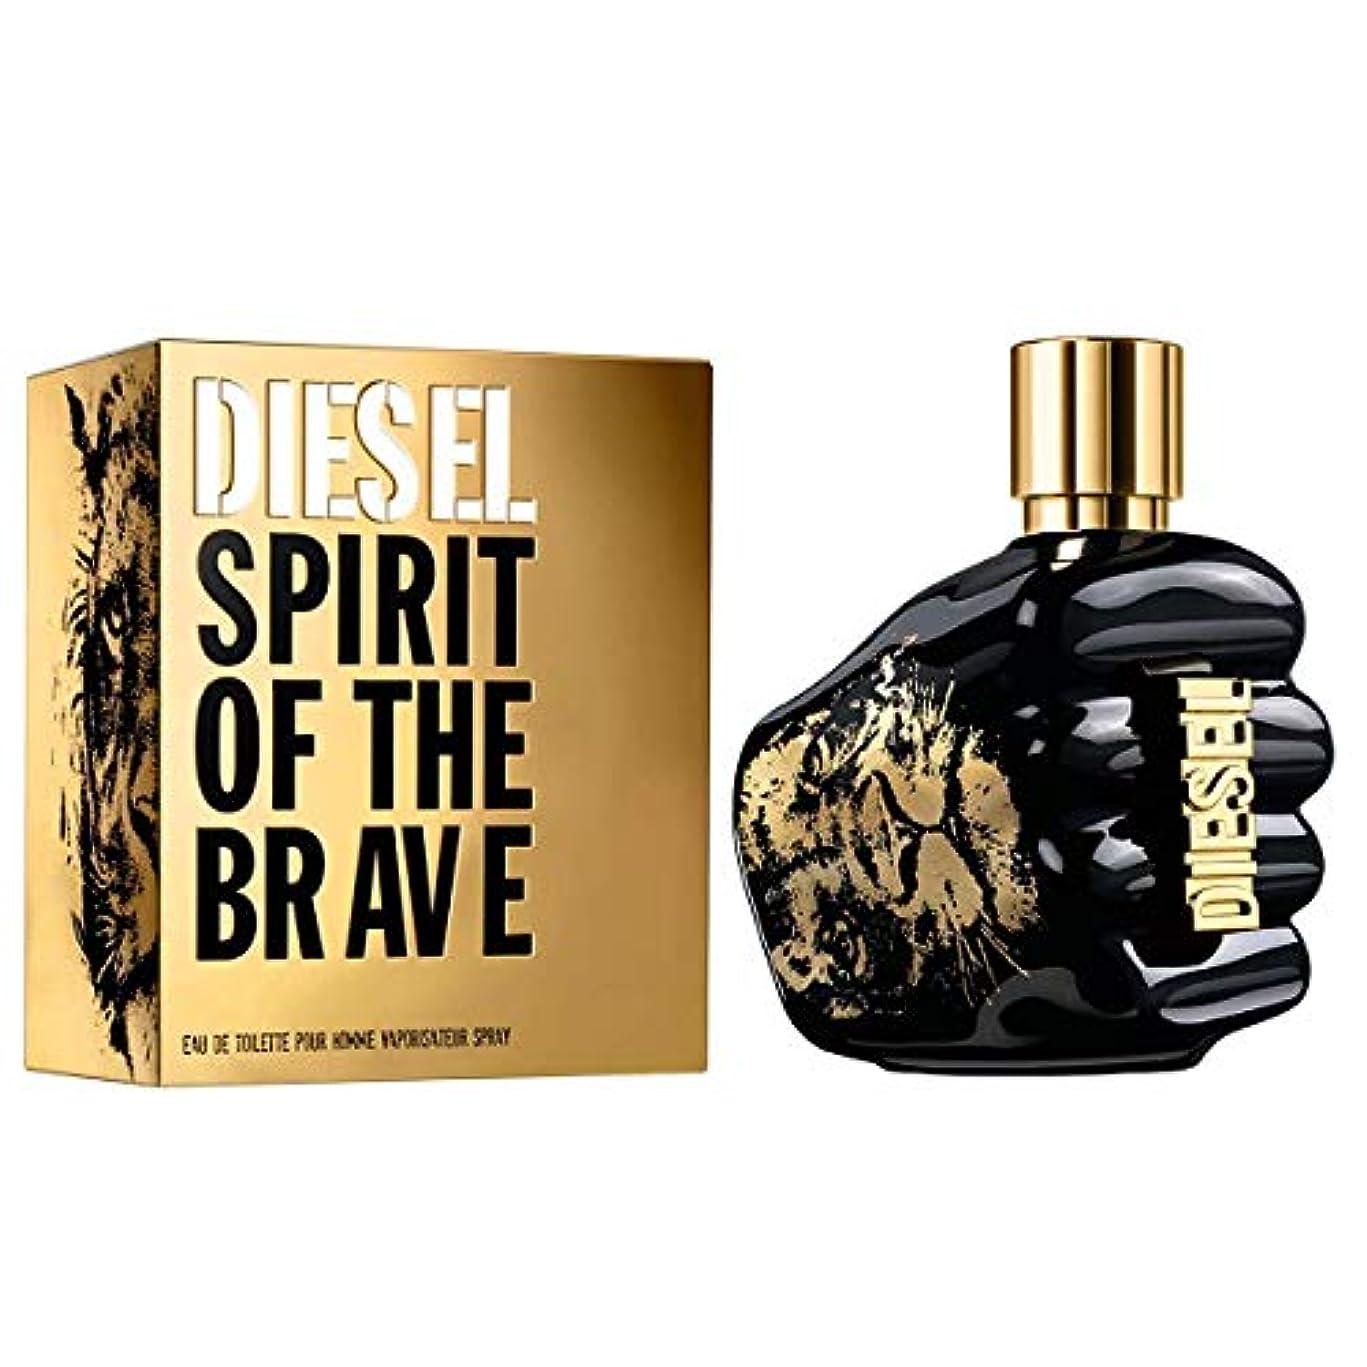 船外倒産呪いDiesel Spirit Of the Brave 125 ml Eau de Toilette